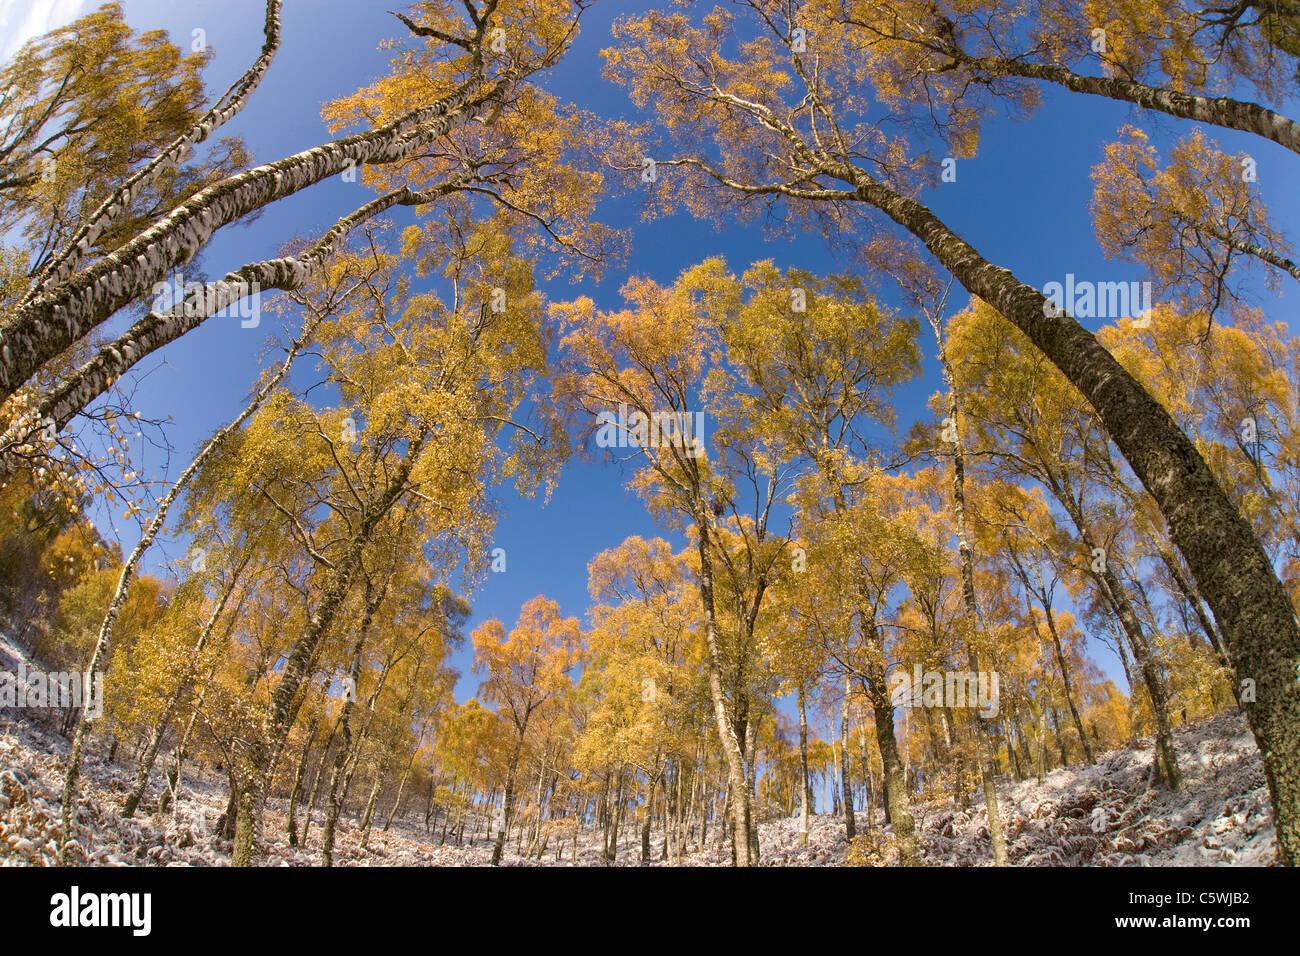 Silver Birch (Betula pendula), woodland in autumn. Craigellachie National Nature Reserve, Scotland, Great Britain. - Stock Image